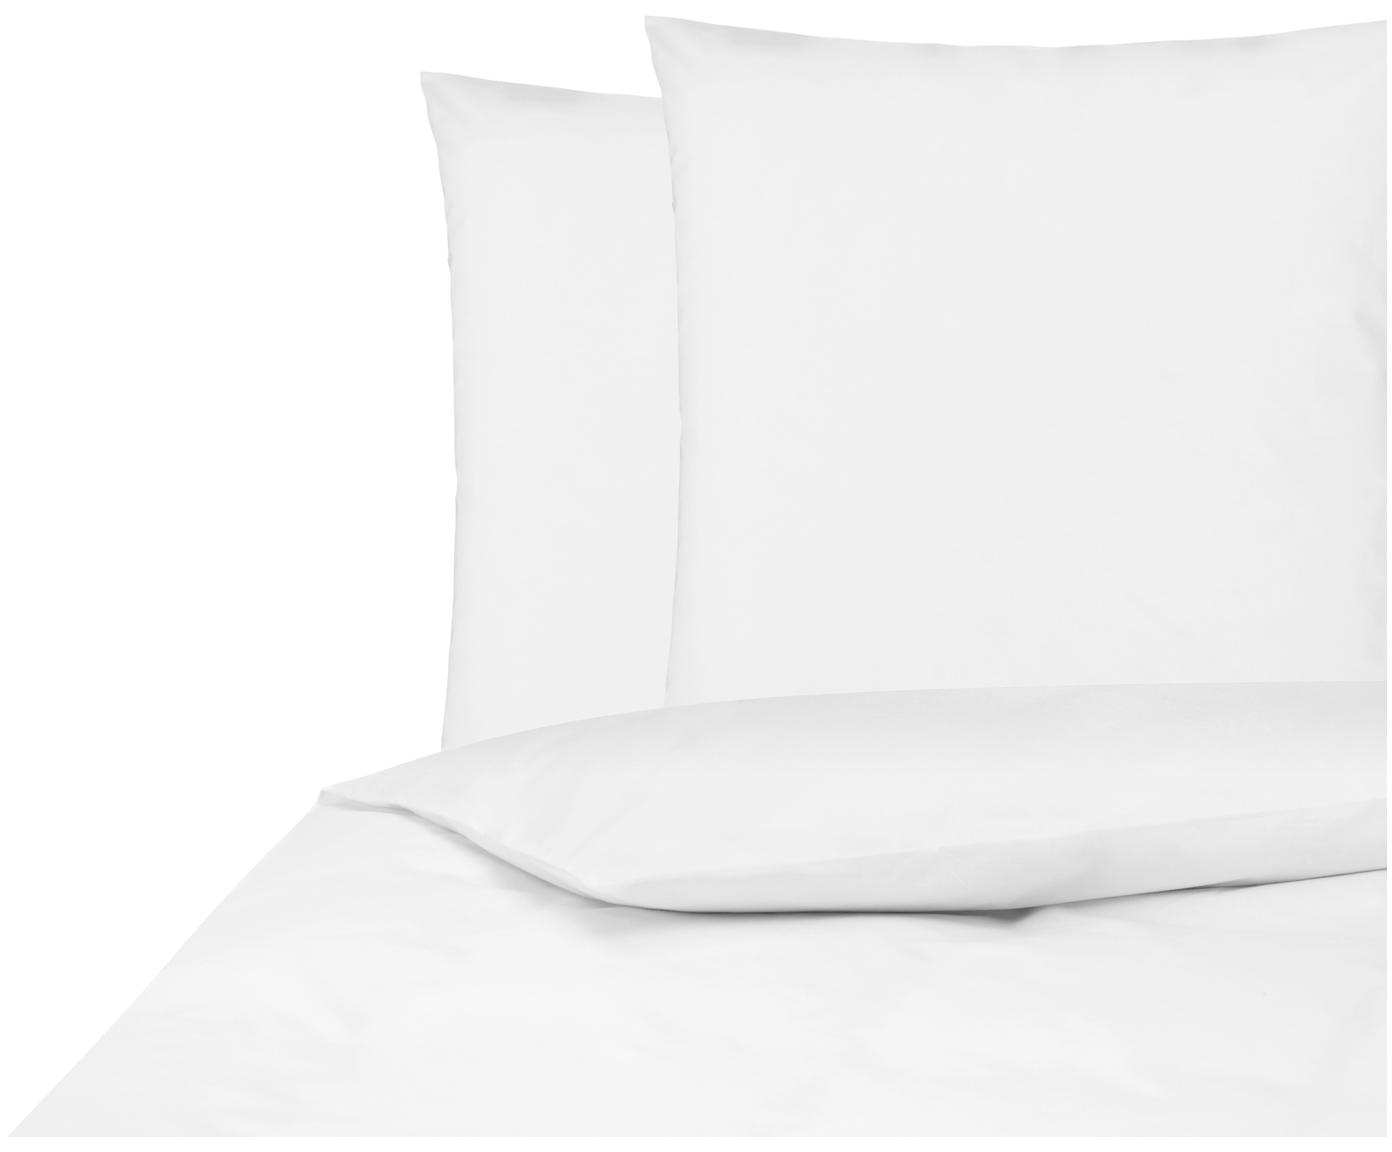 Baumwollperkal-Bettwäsche Elsie in Weiß, Webart: Perkal Fadendichte 200 TC, Weiß, 240 x 220 cm + 2 Kissen 80 x 80 cm